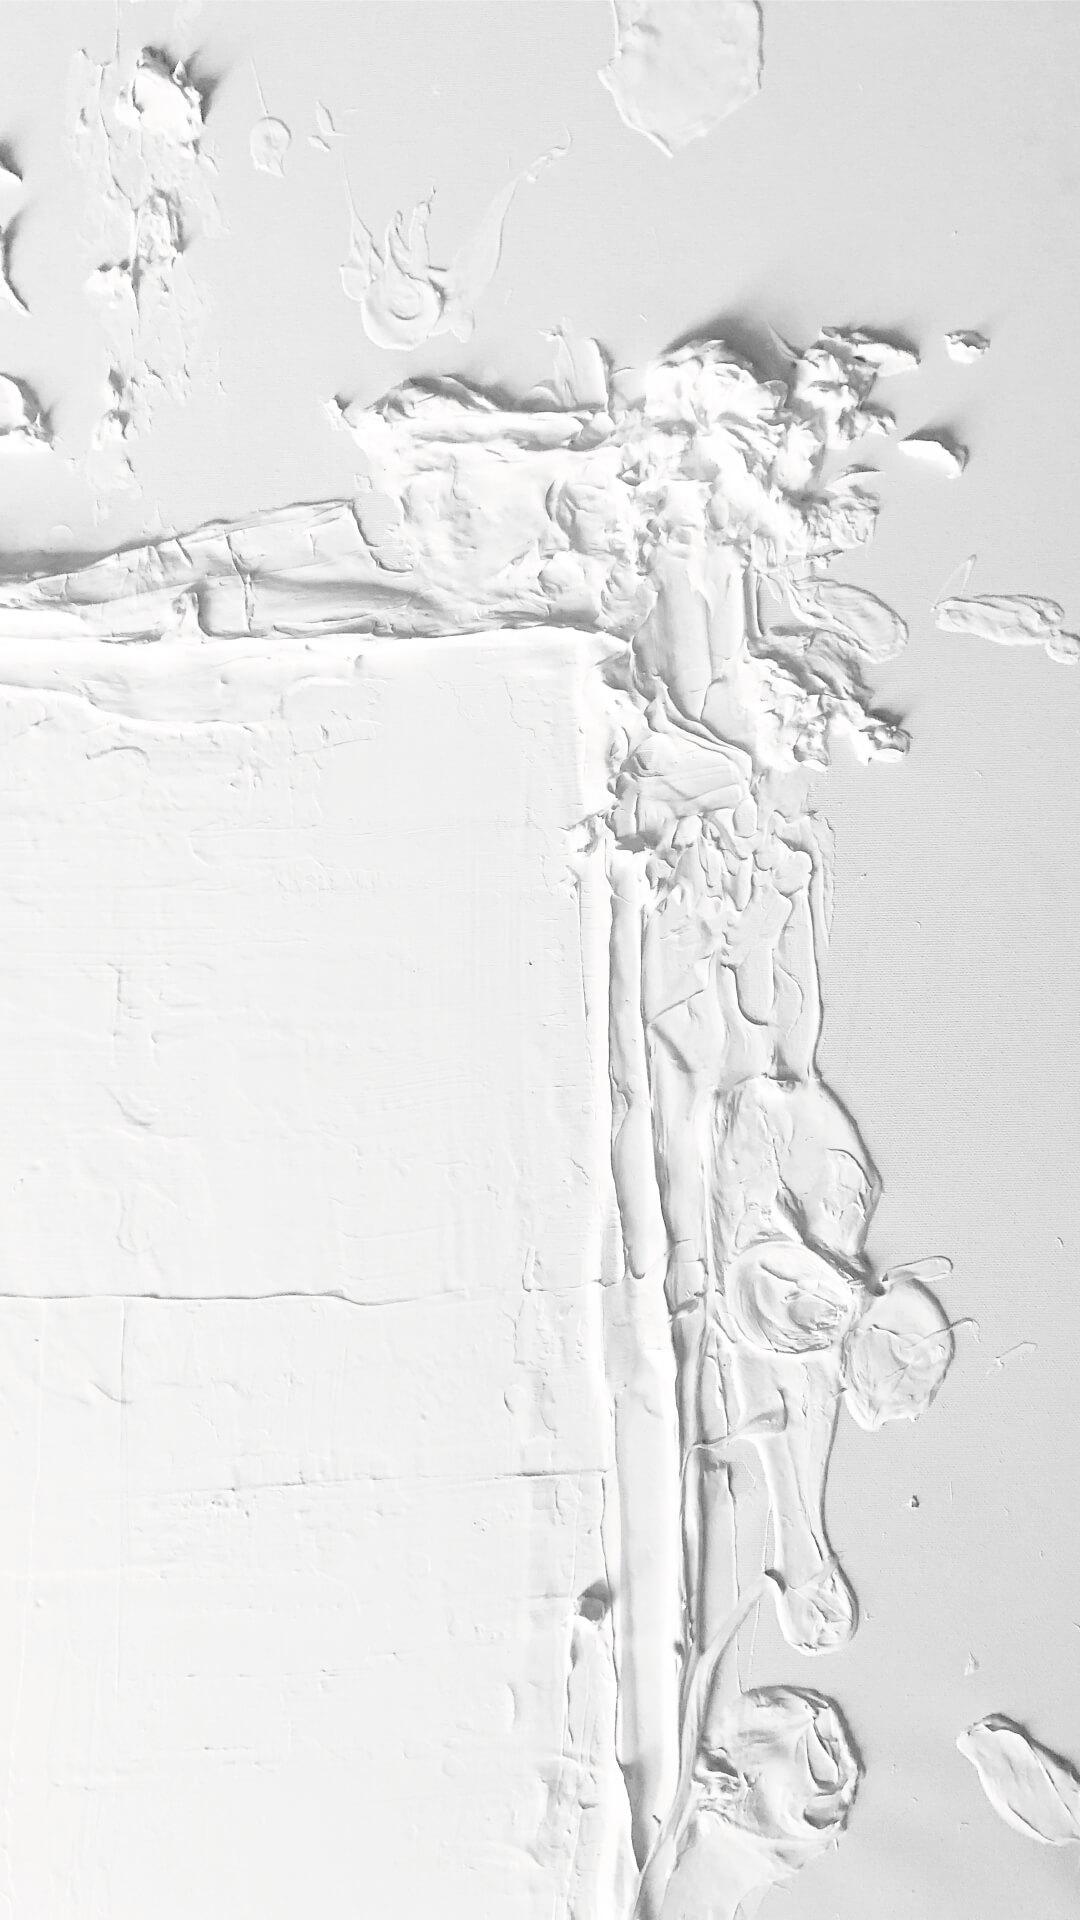 04-ELTIEMPO-AARON-NACHTAILER-ART-ARTIST-MARBLE-VERTICAL